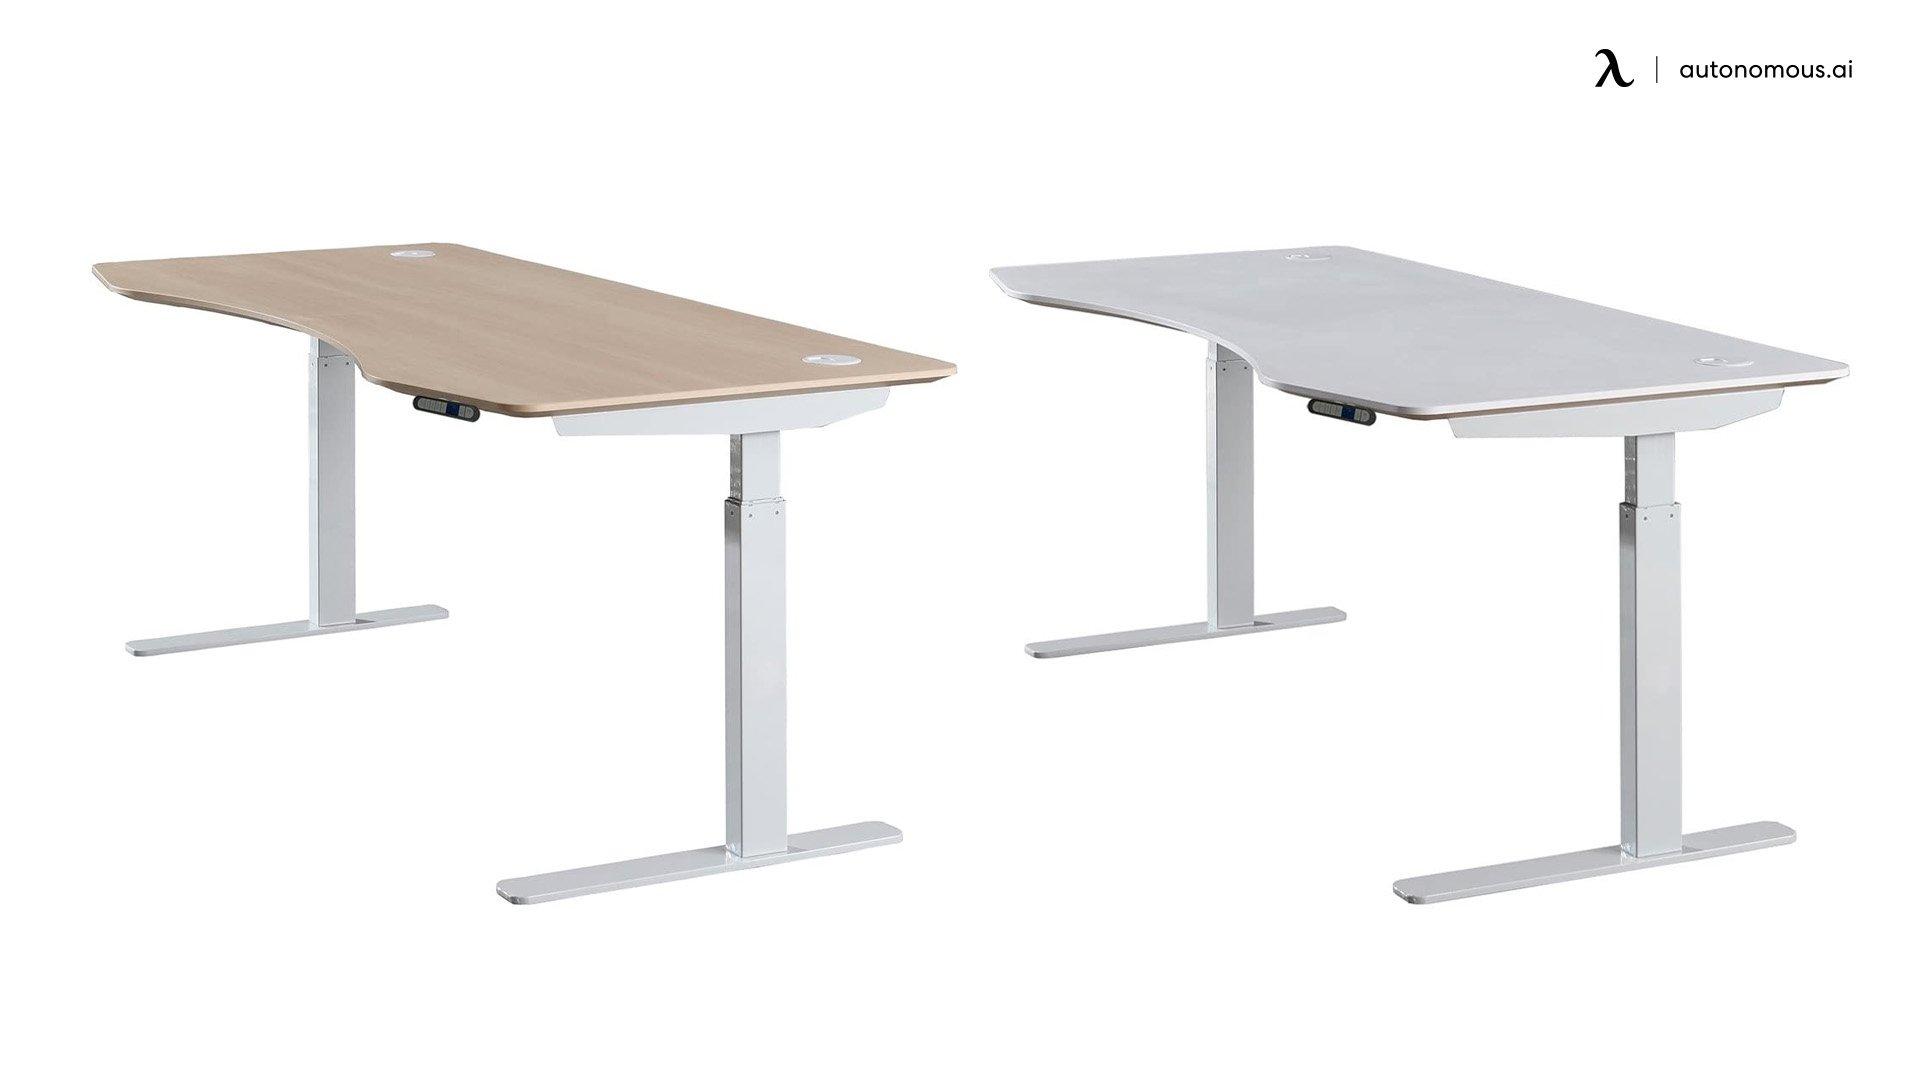 Apexdesk Height Adjustable Study Desk